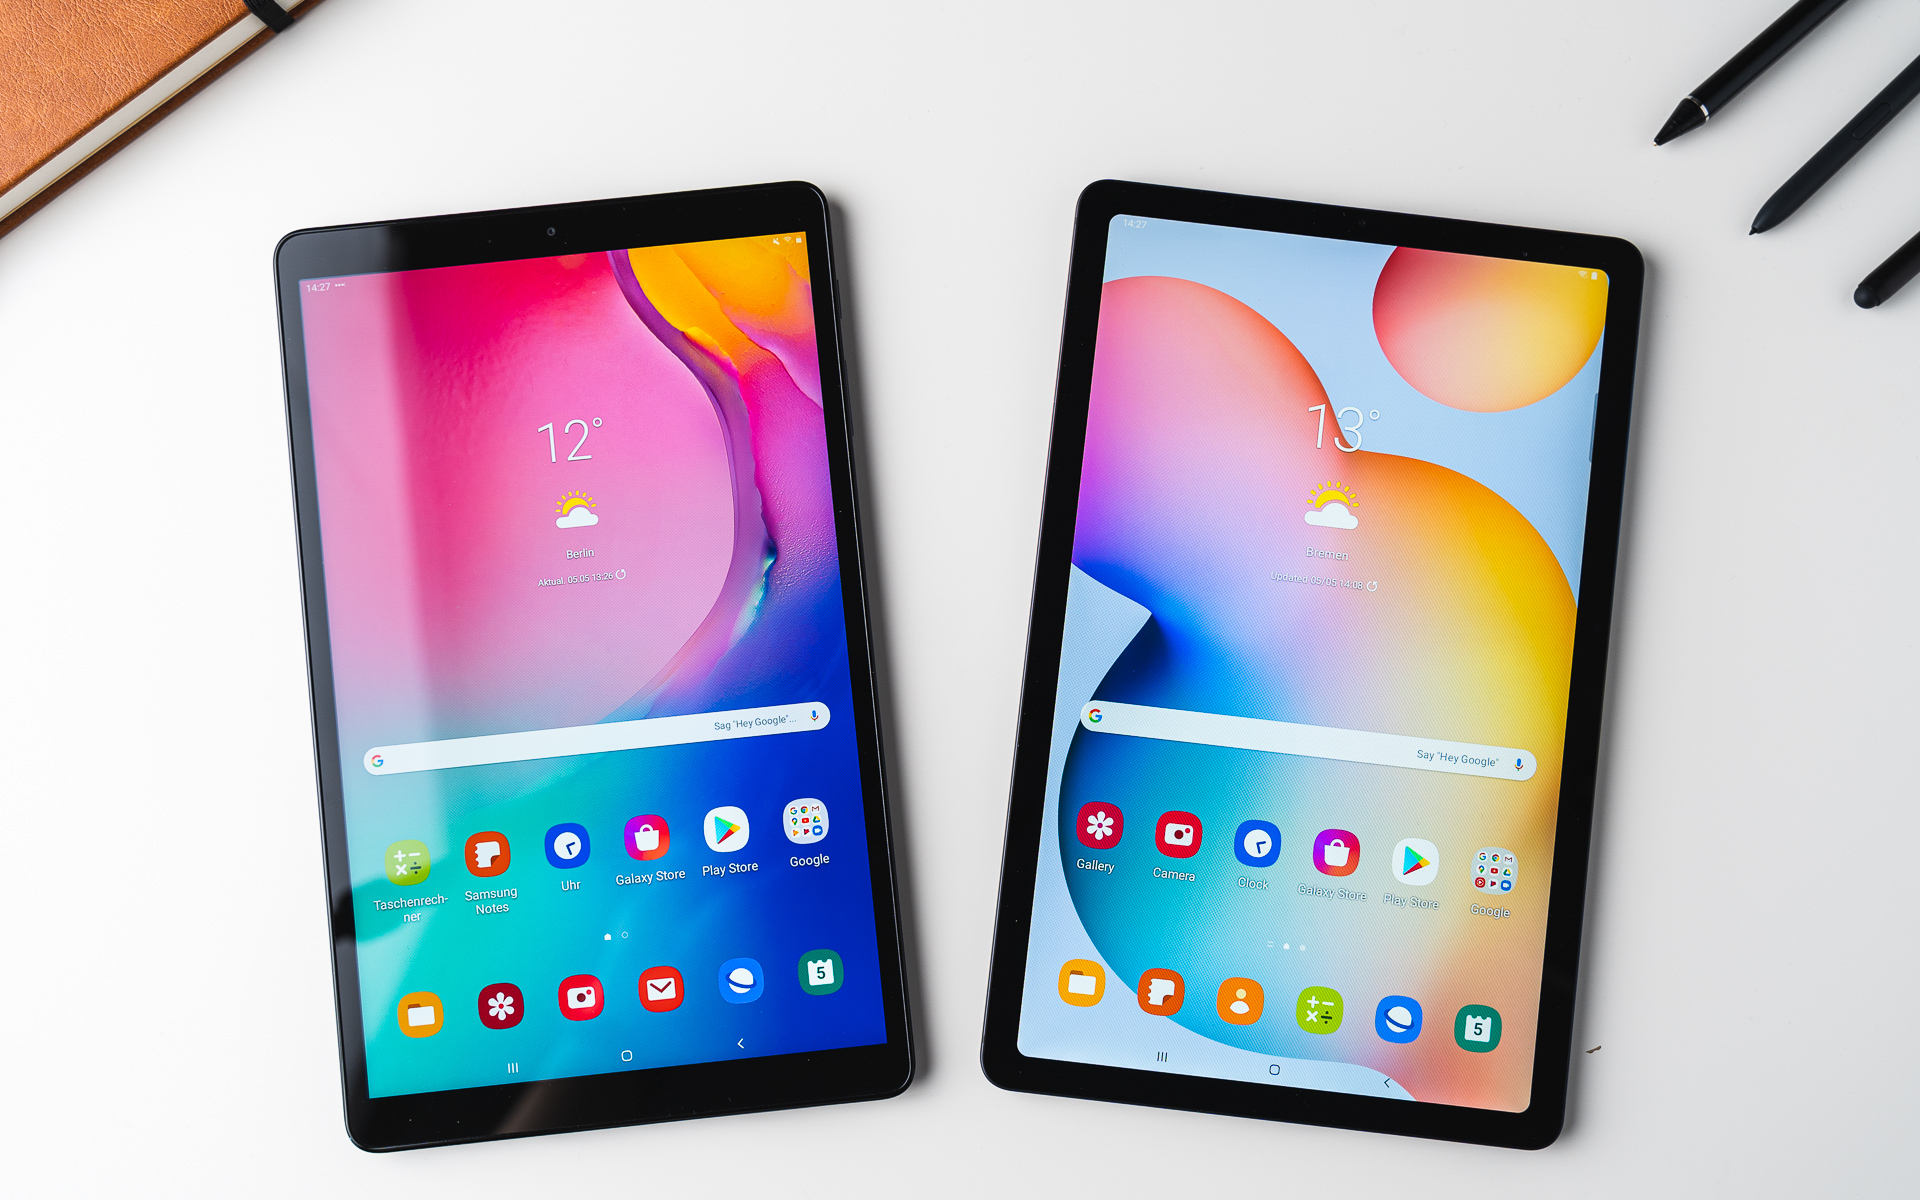 Samsung Galaxy Tab S6 Lite Vs Galaxy Tab A 10 1 Comparison